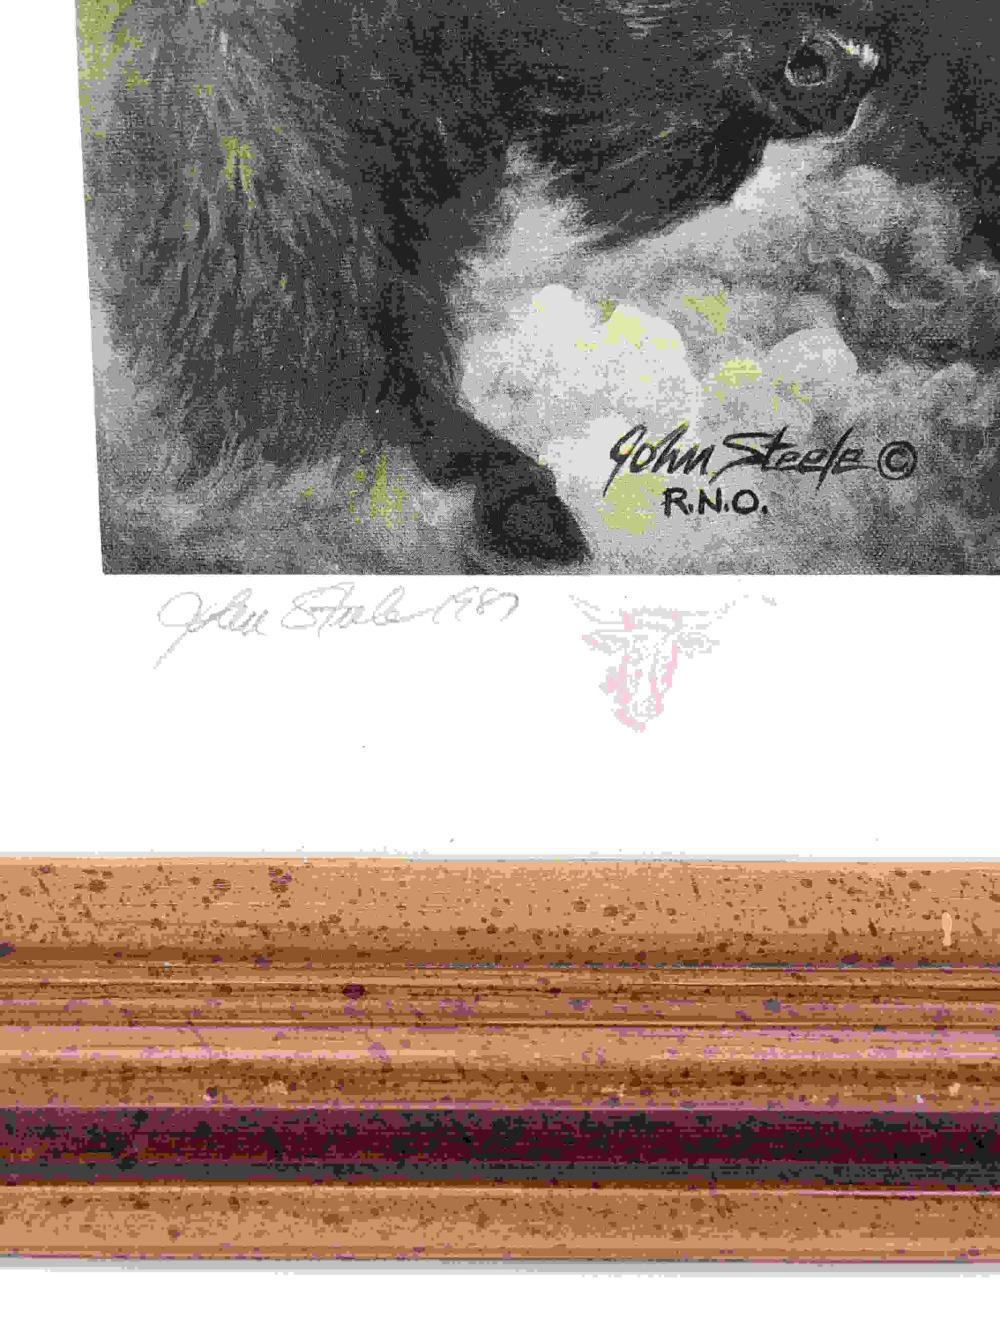 JOHN STEELE ART PRINT IRON EYES CODY ANTI-POLLUTION CAMPAIGN 22.5 X 17